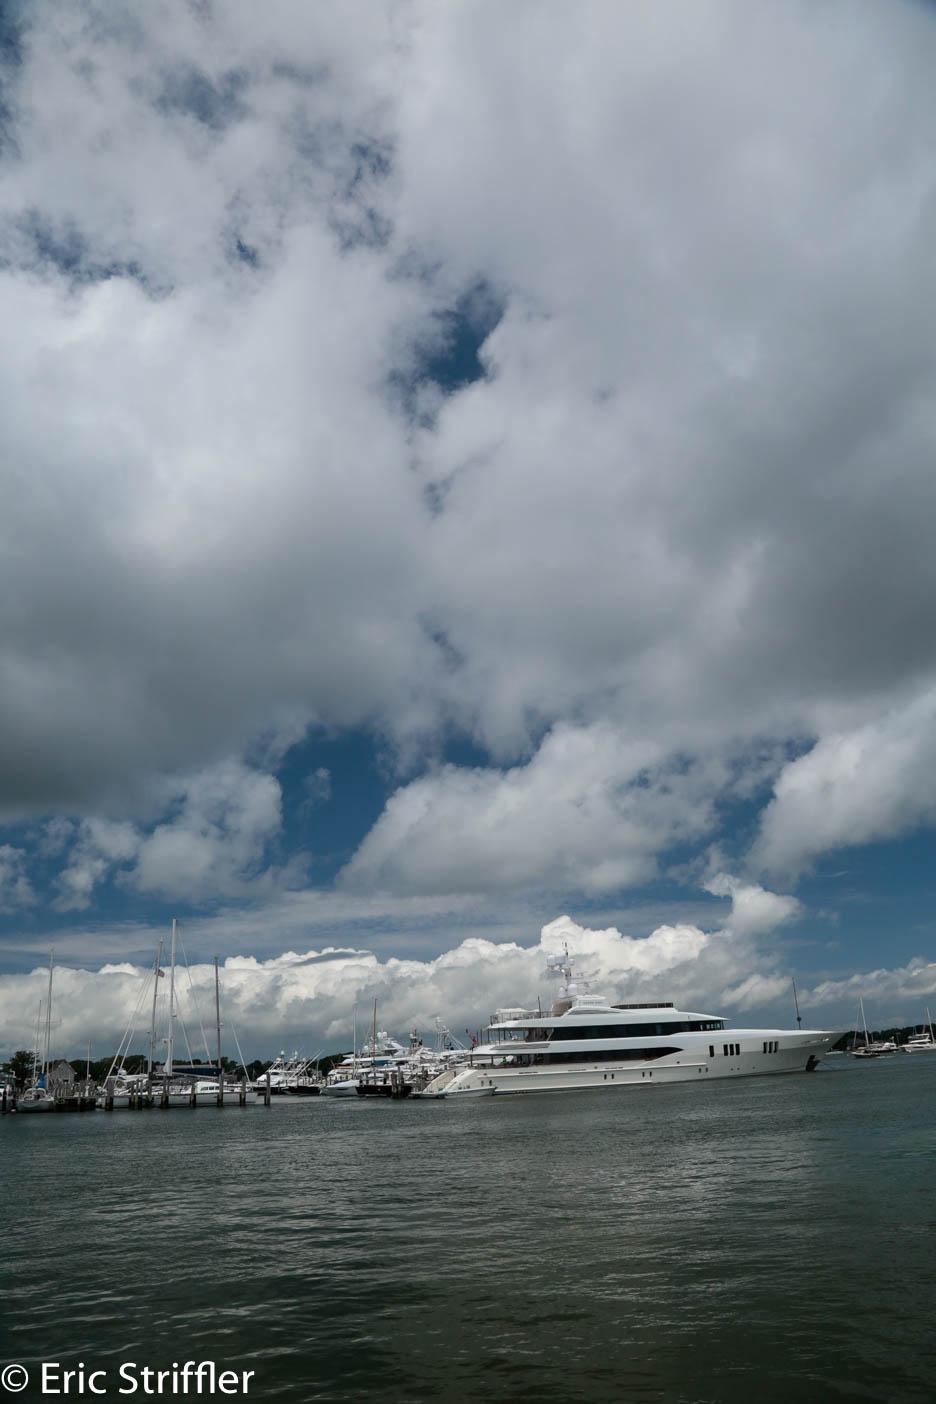 danielle_naftali_hmptns_boating-1319.jpg